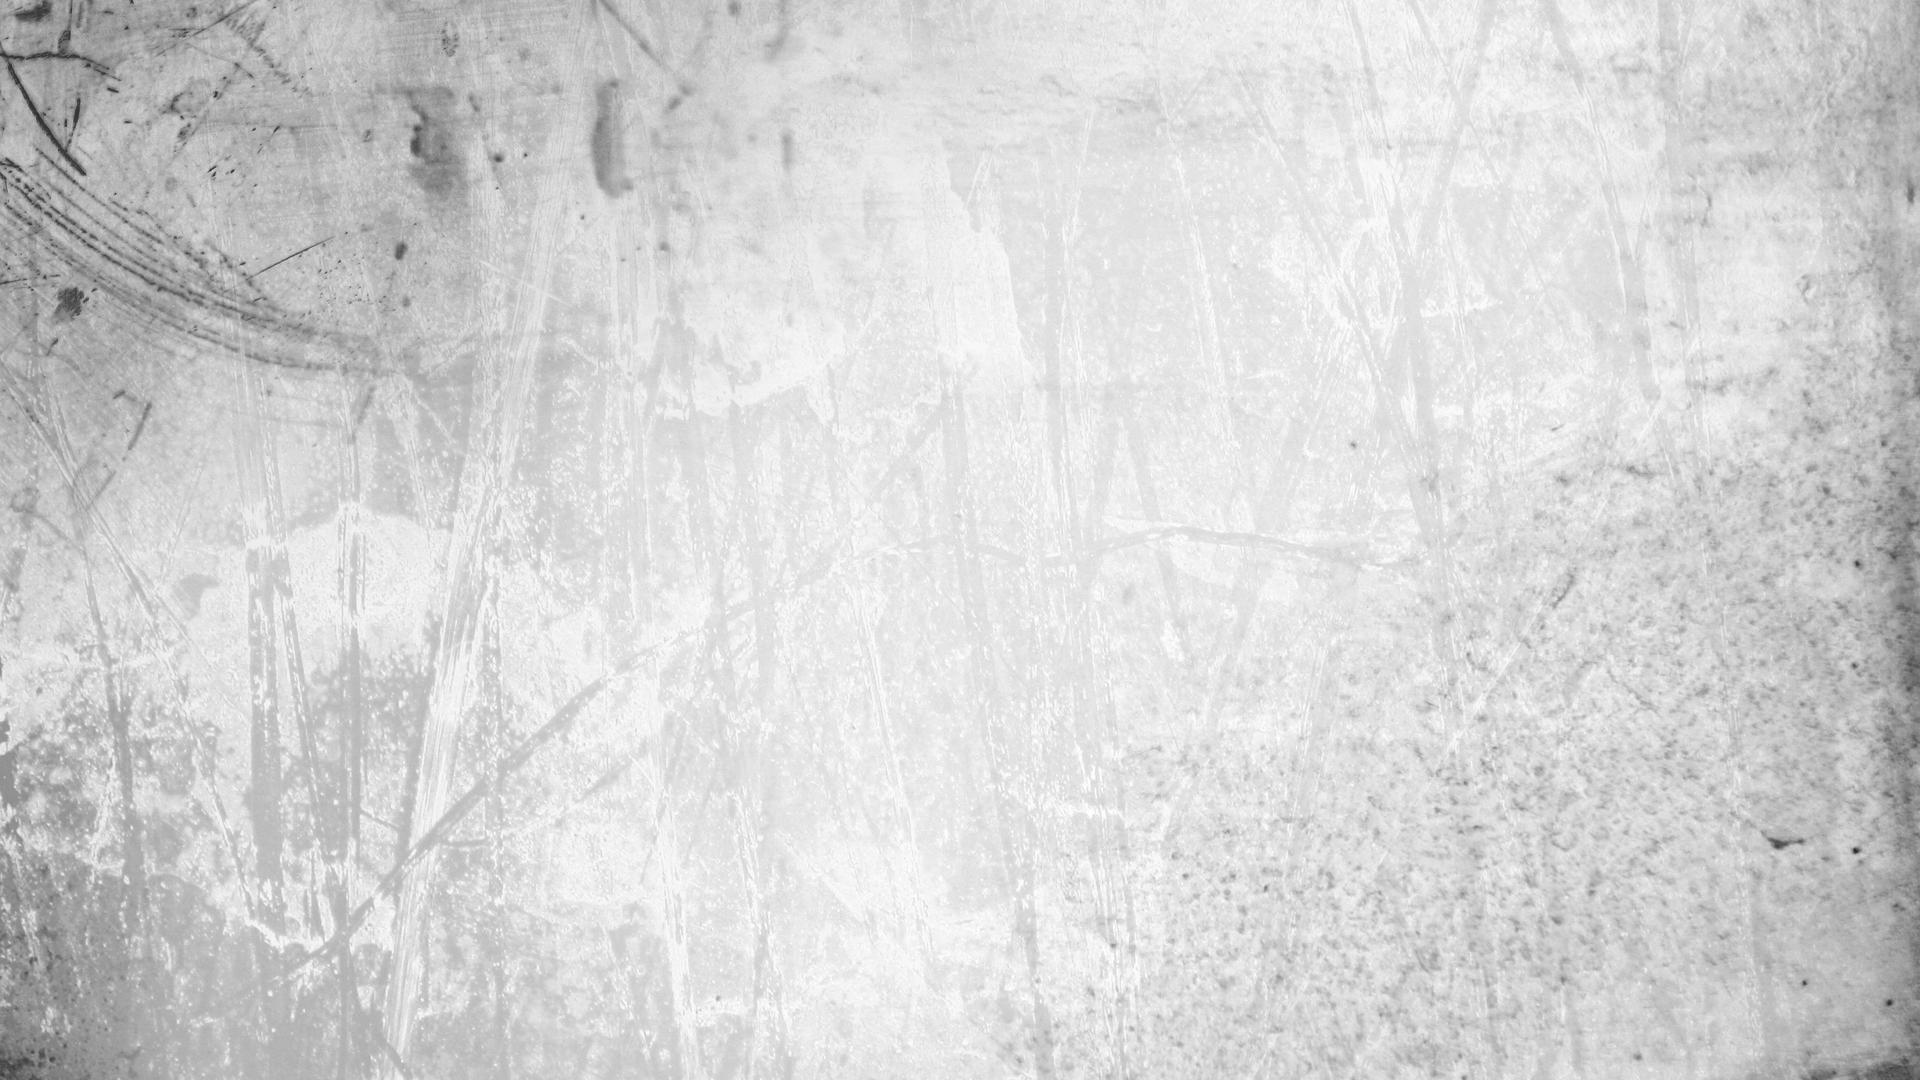 Free photo: Dirty texture - Dirt, Metallic, Paint - Free Download - Jooinn